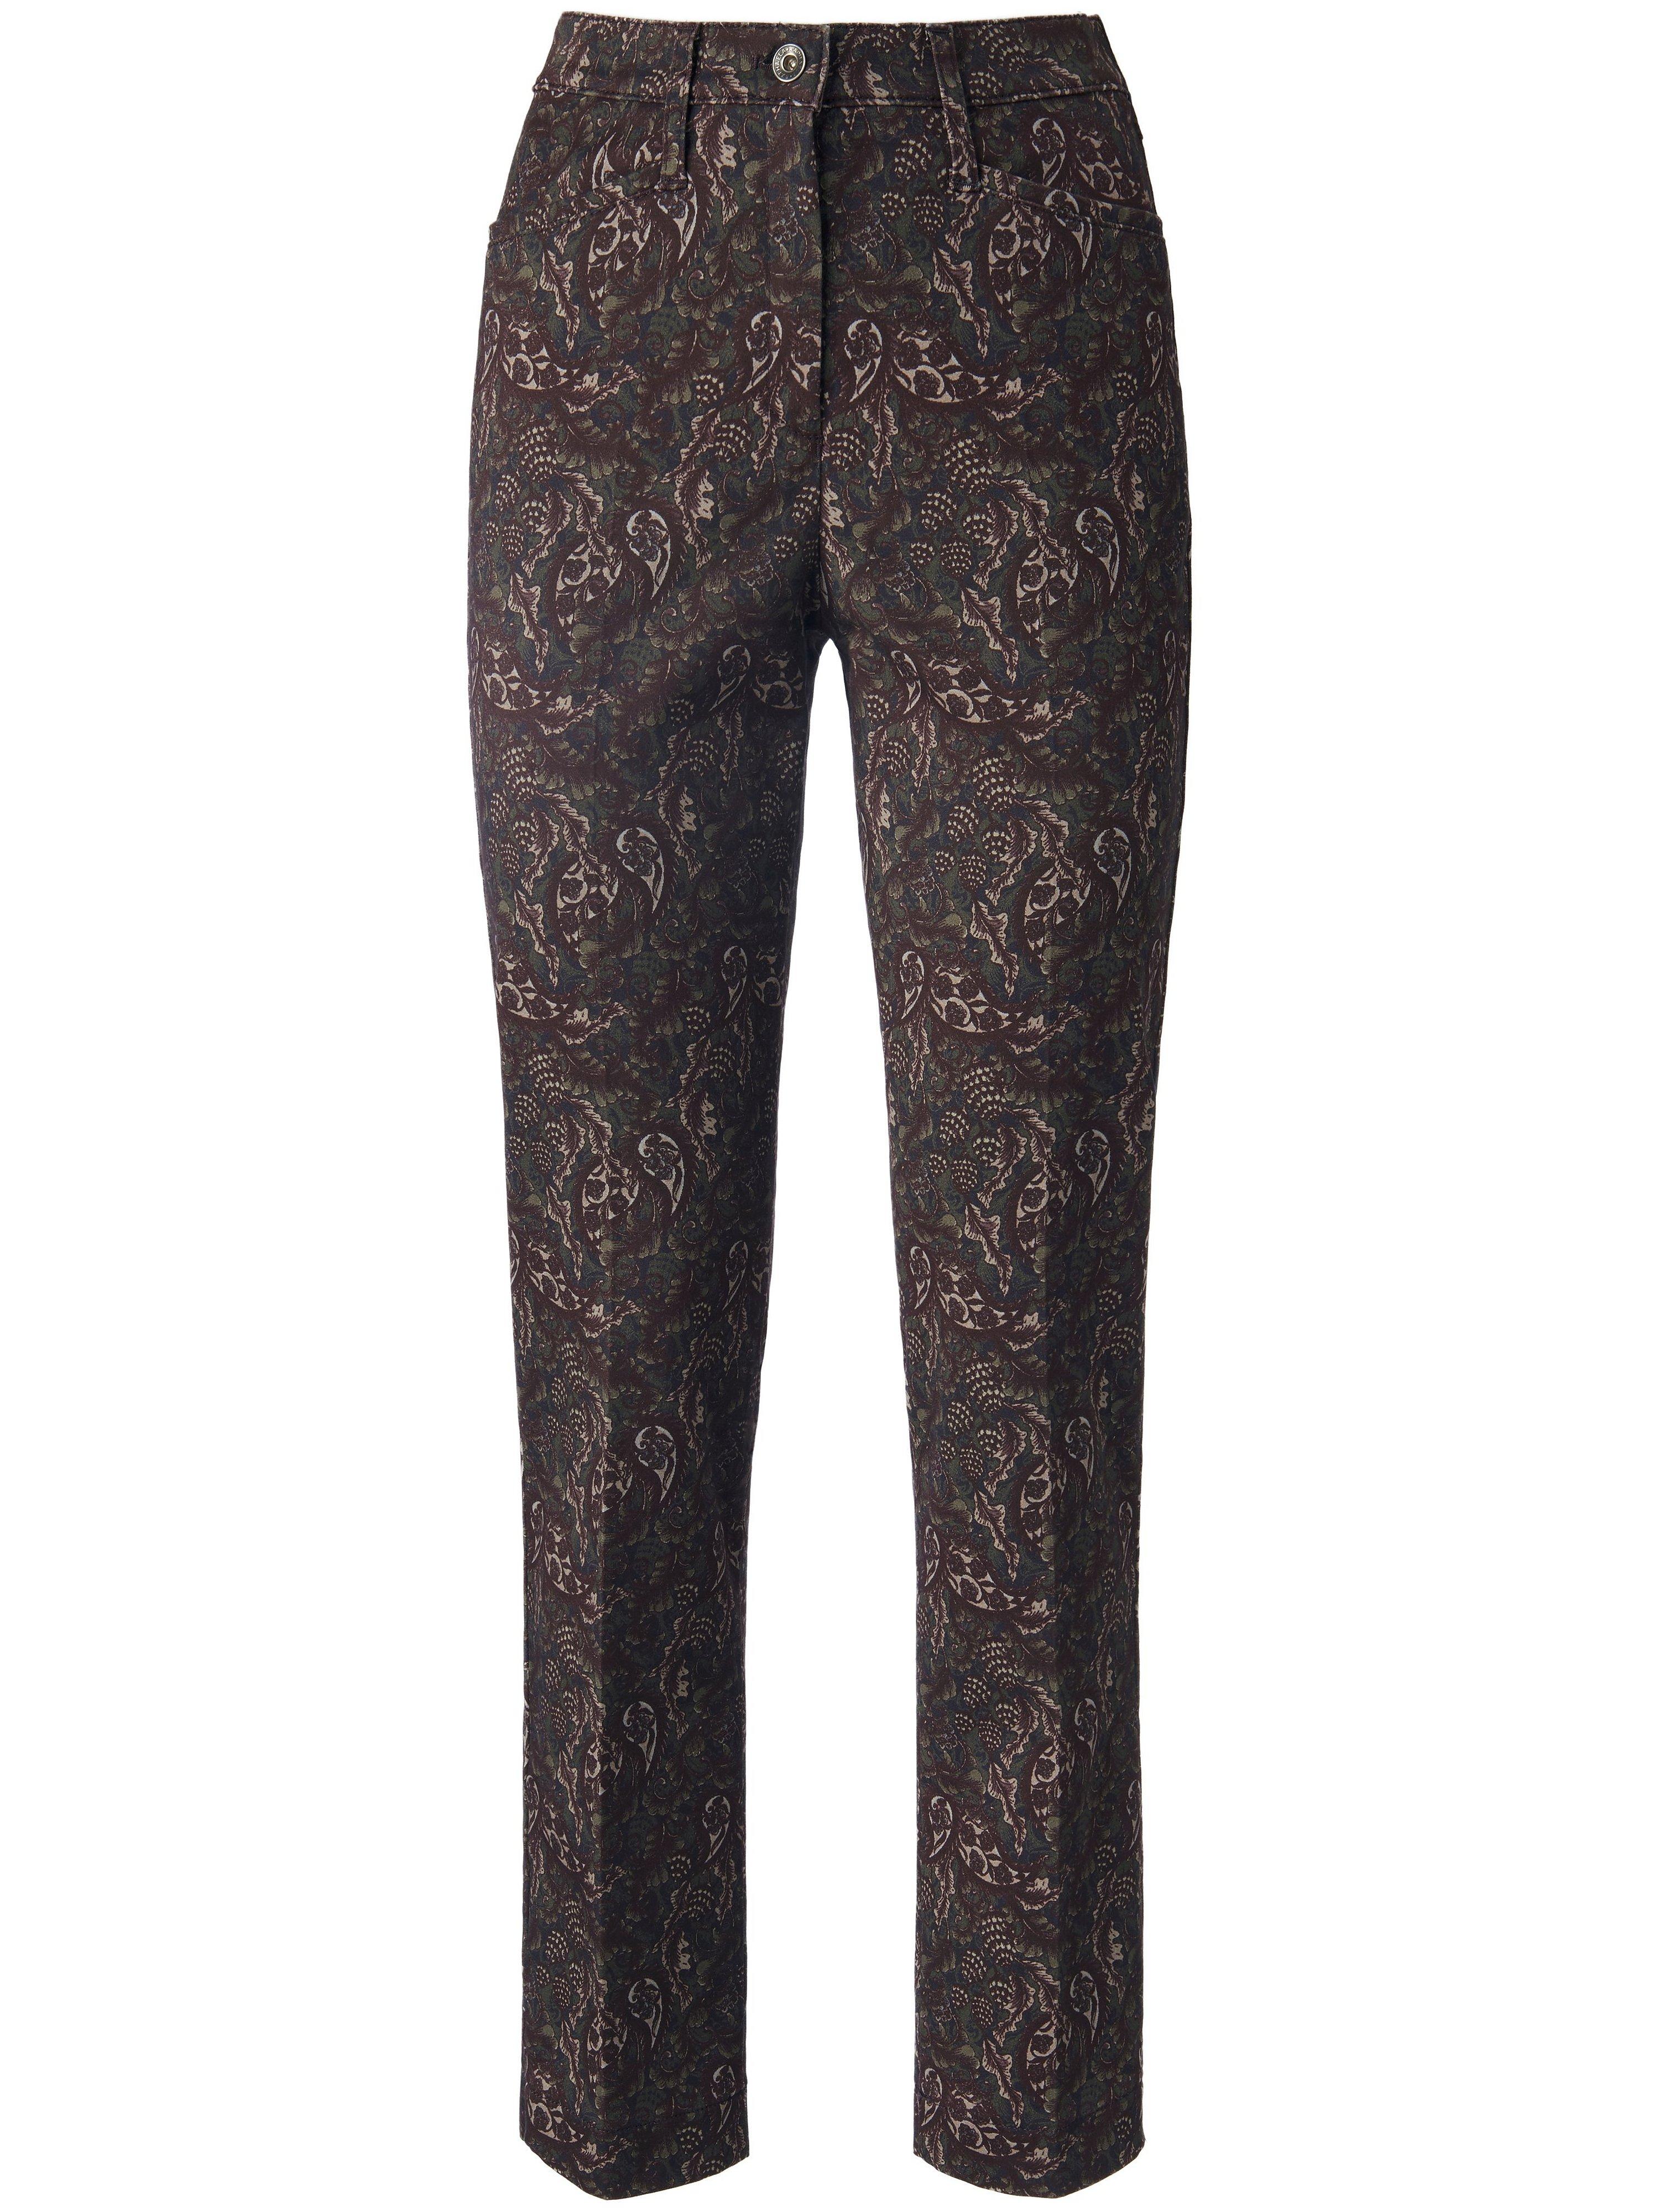 Enkellange ProForm S Super Slim-broek Van Raphaela by Brax bruin